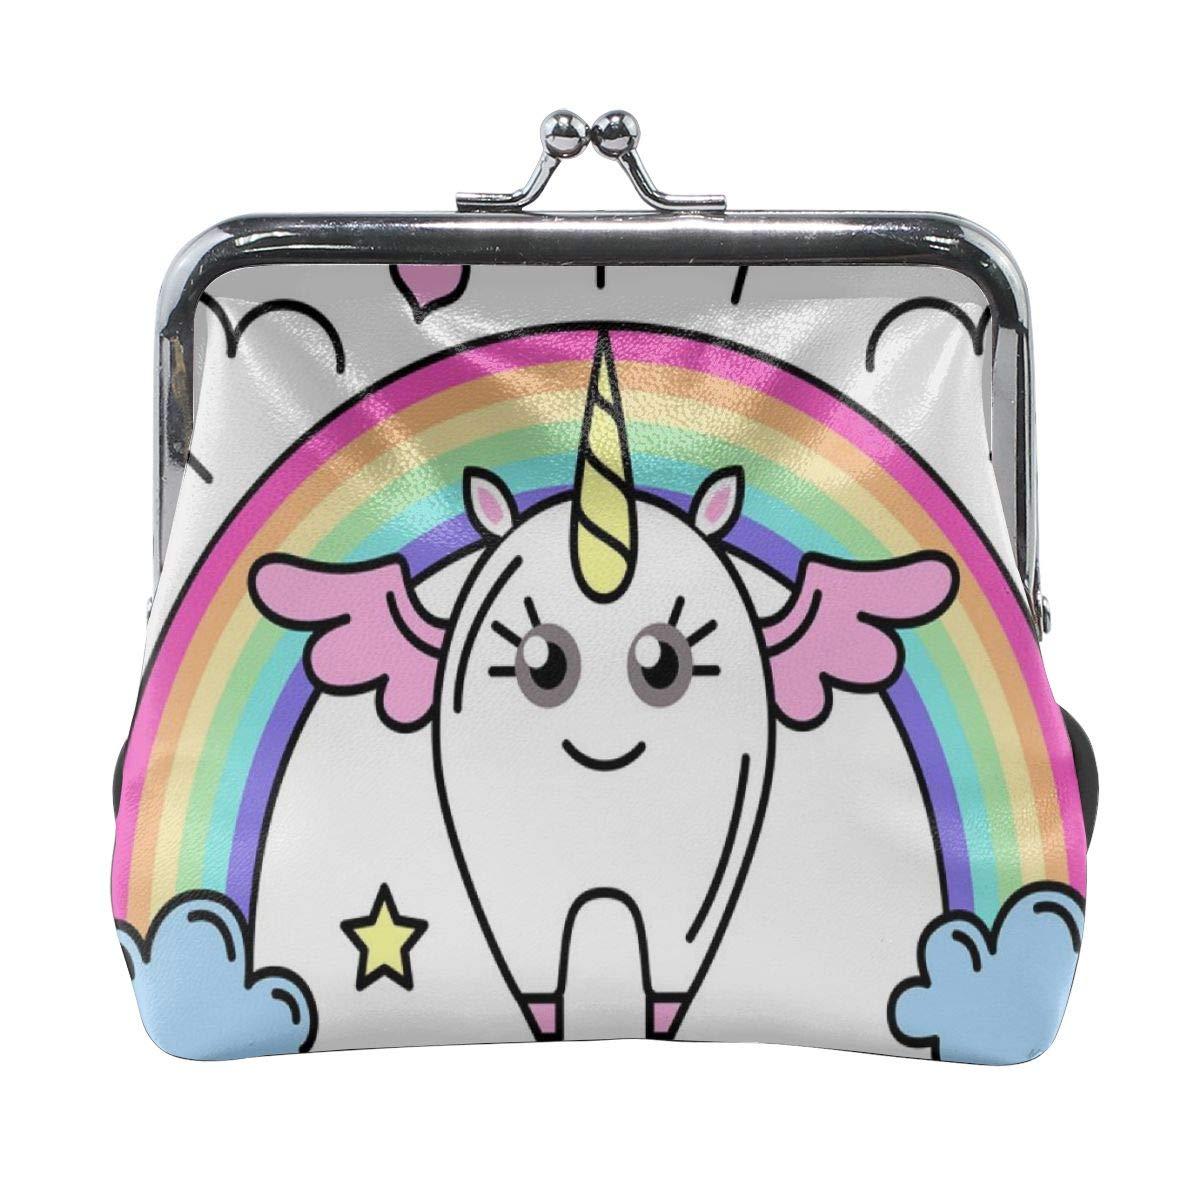 Girl Kiss And Buckle Change Purse Ladys HandbagCute One-horned Cartoon Animal Rainbow White Personality Metal Lock Purse Architd Customized Cute Retro Coin Purse